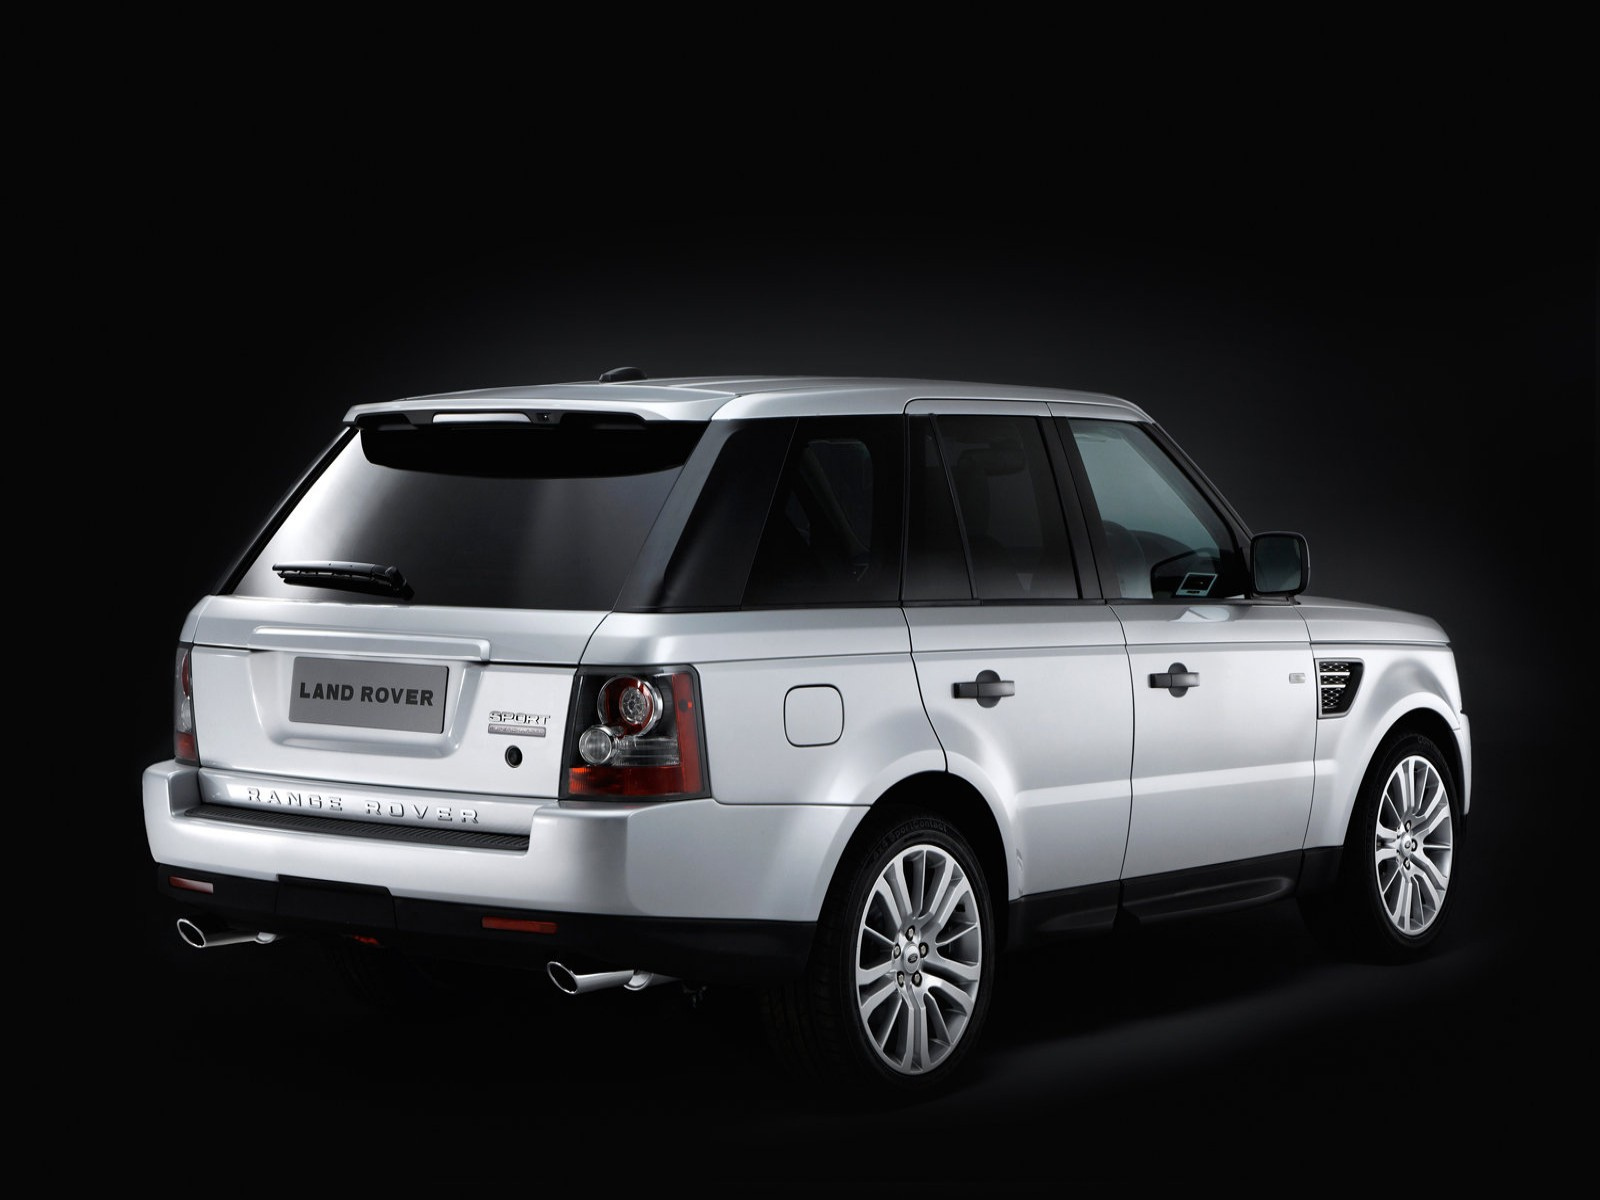 car specs review 2006 land rover range rover sport tdv8 specs engine review. Black Bedroom Furniture Sets. Home Design Ideas